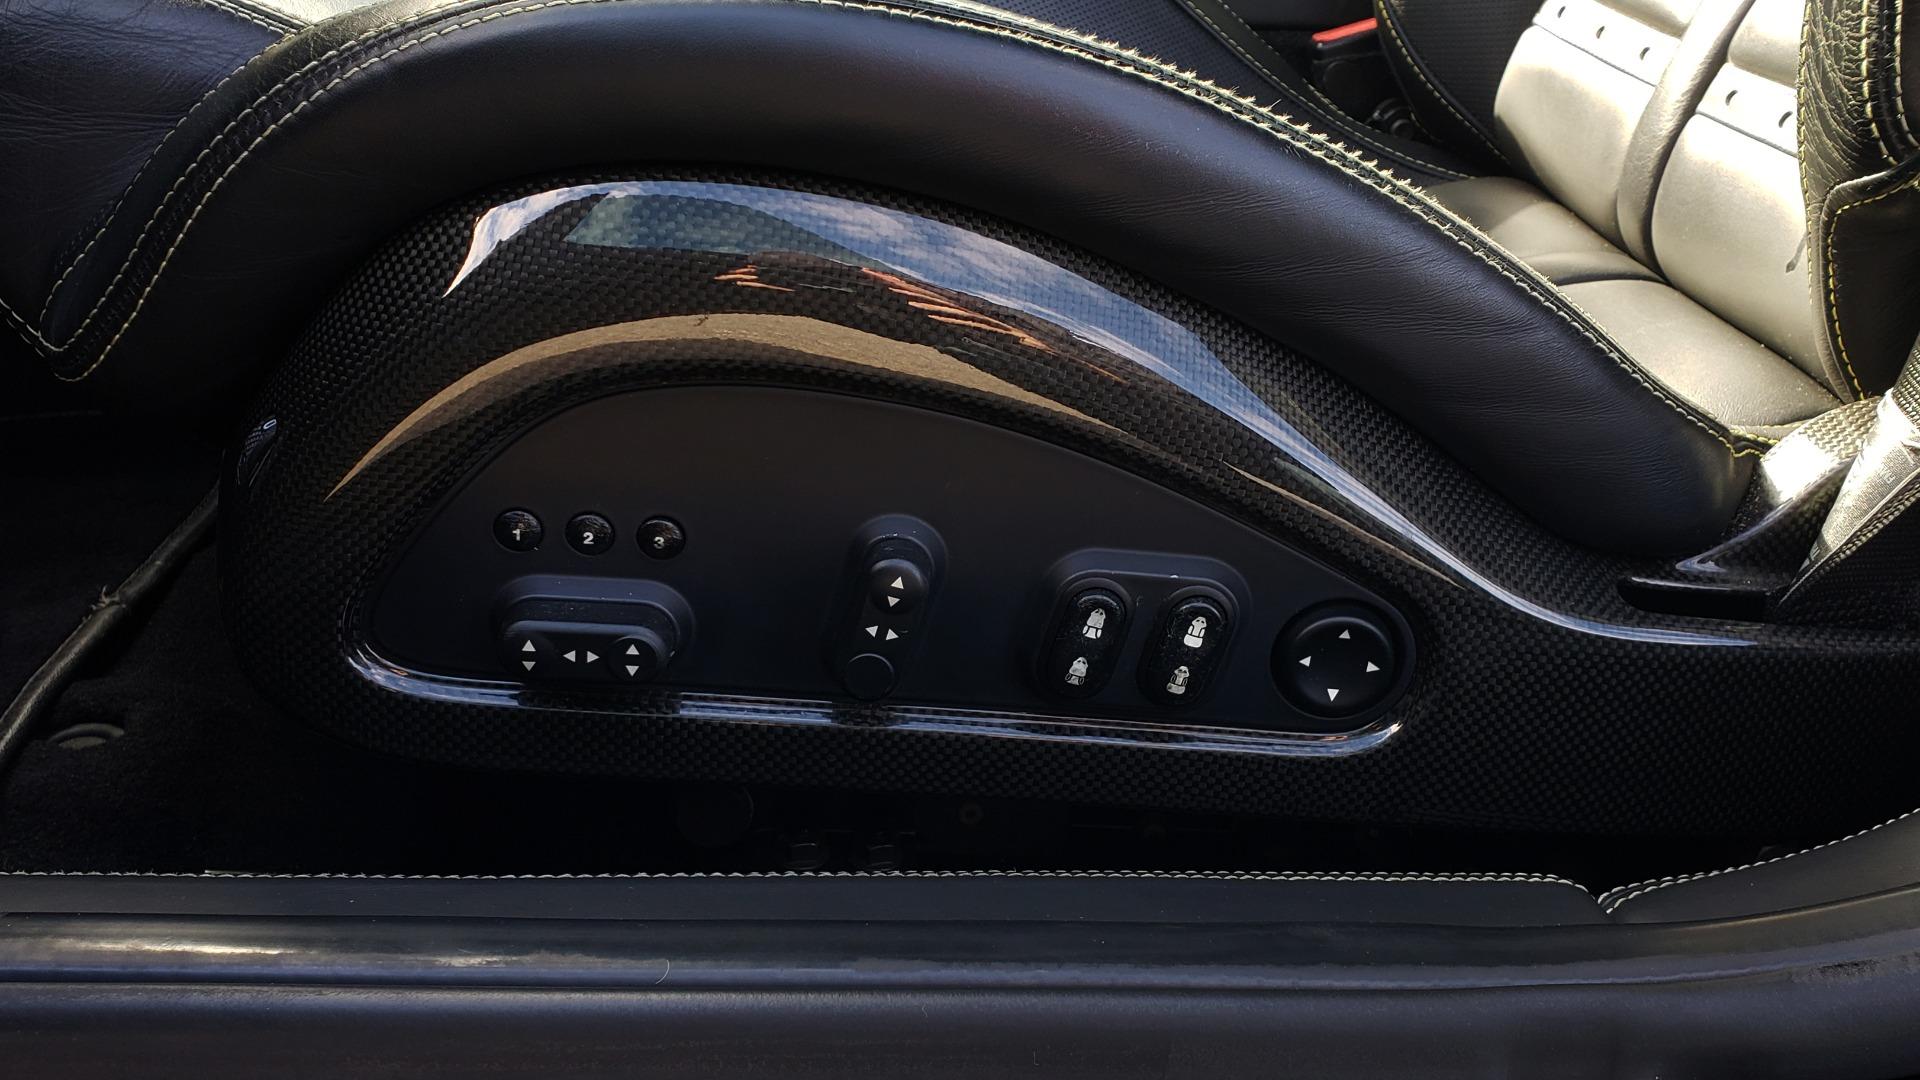 Used 2007 Ferrari 599 GTB FIORANO HGTE / V12 / F1 TRANS / NAV / BOSE / CUSTOM WHEELS for sale $109,999 at Formula Imports in Charlotte NC 28227 85